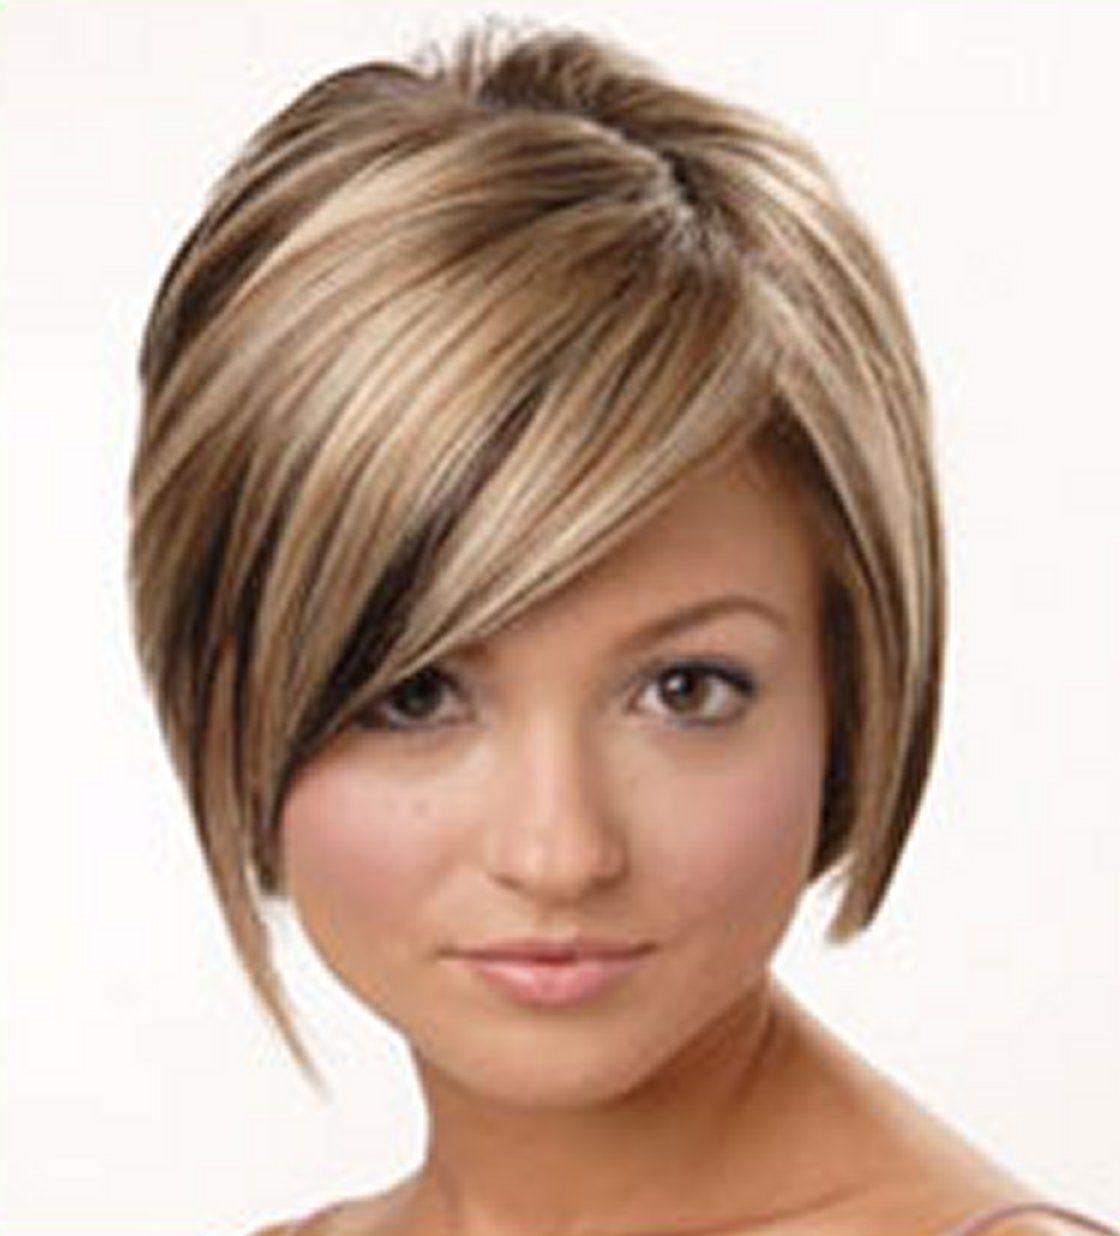 42 coiffures courtes visage rond # | Coiffure courte visage rond, Coiffure courte, Idées de ...